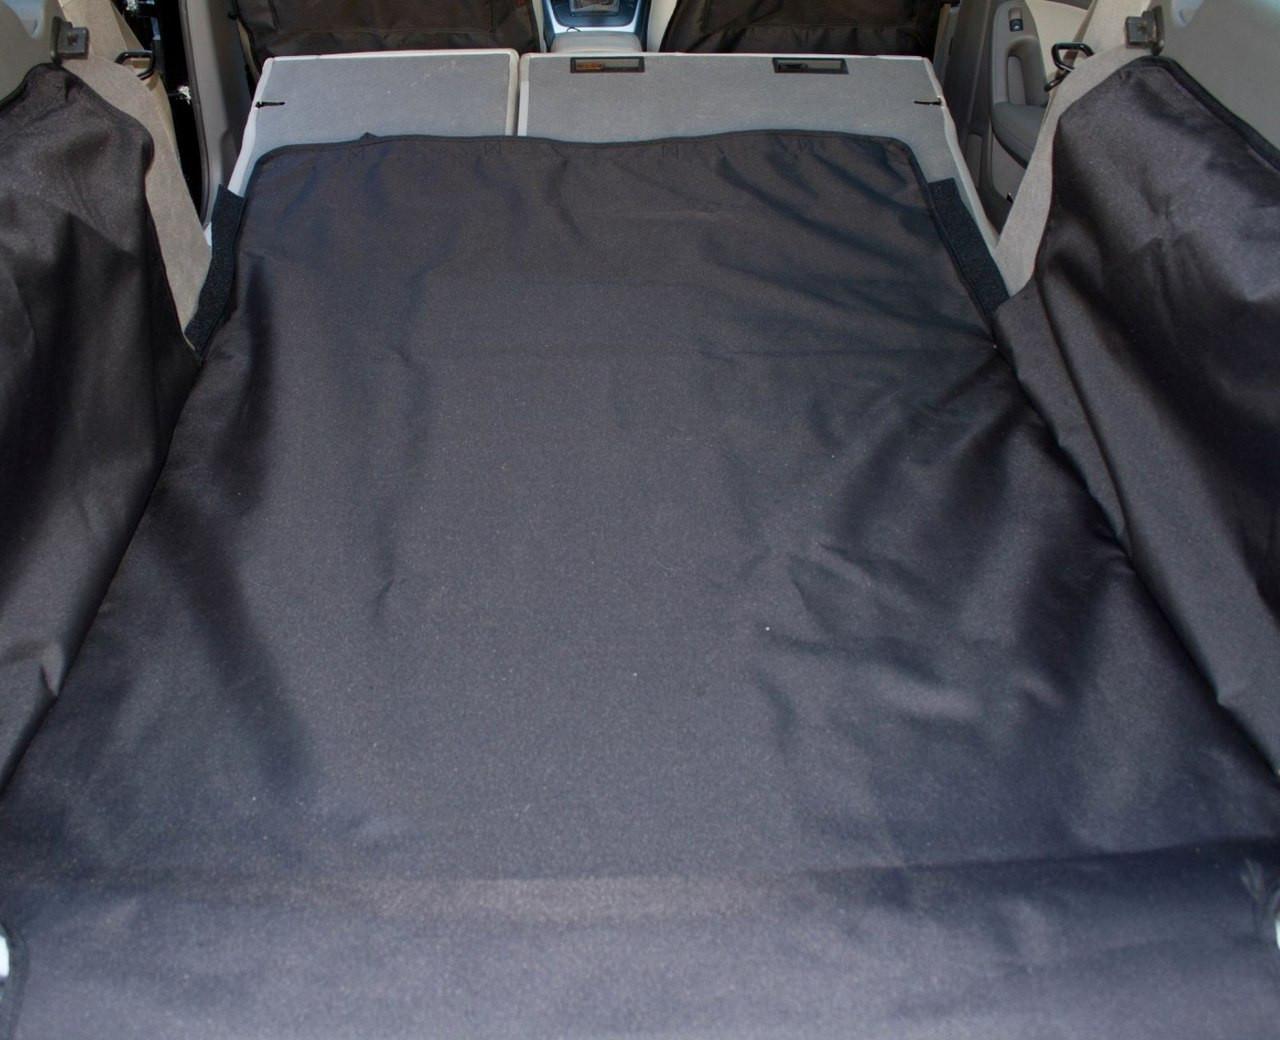 Travelsmart 40385 Car Boot Liner and Bumper Flap to fit Skoda Kodiaq